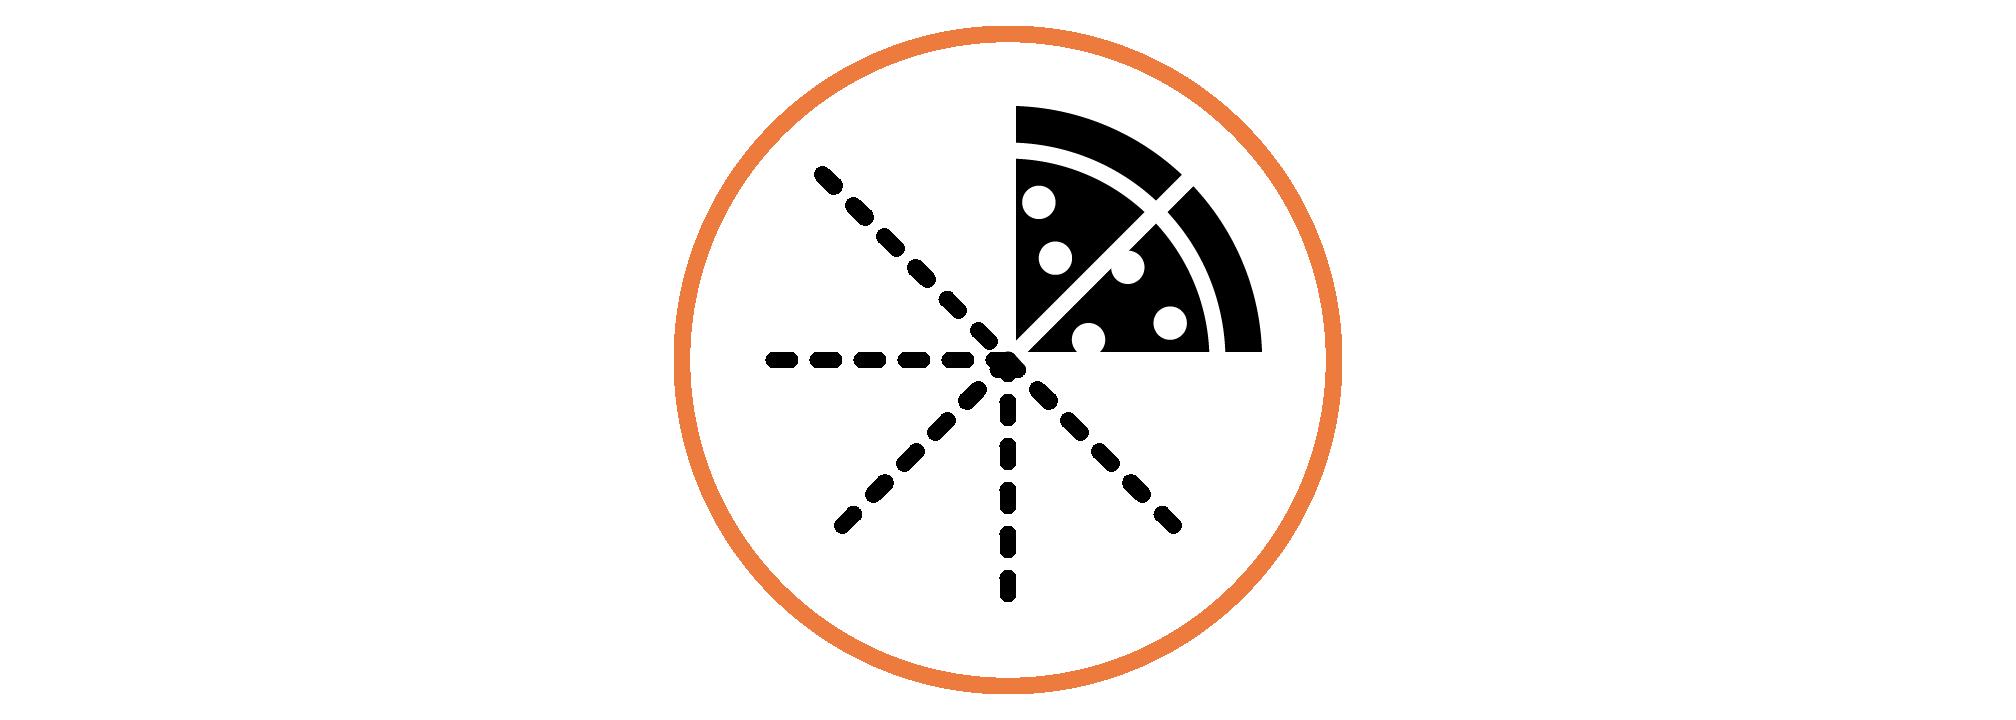 icon-rewards_1-wide.png